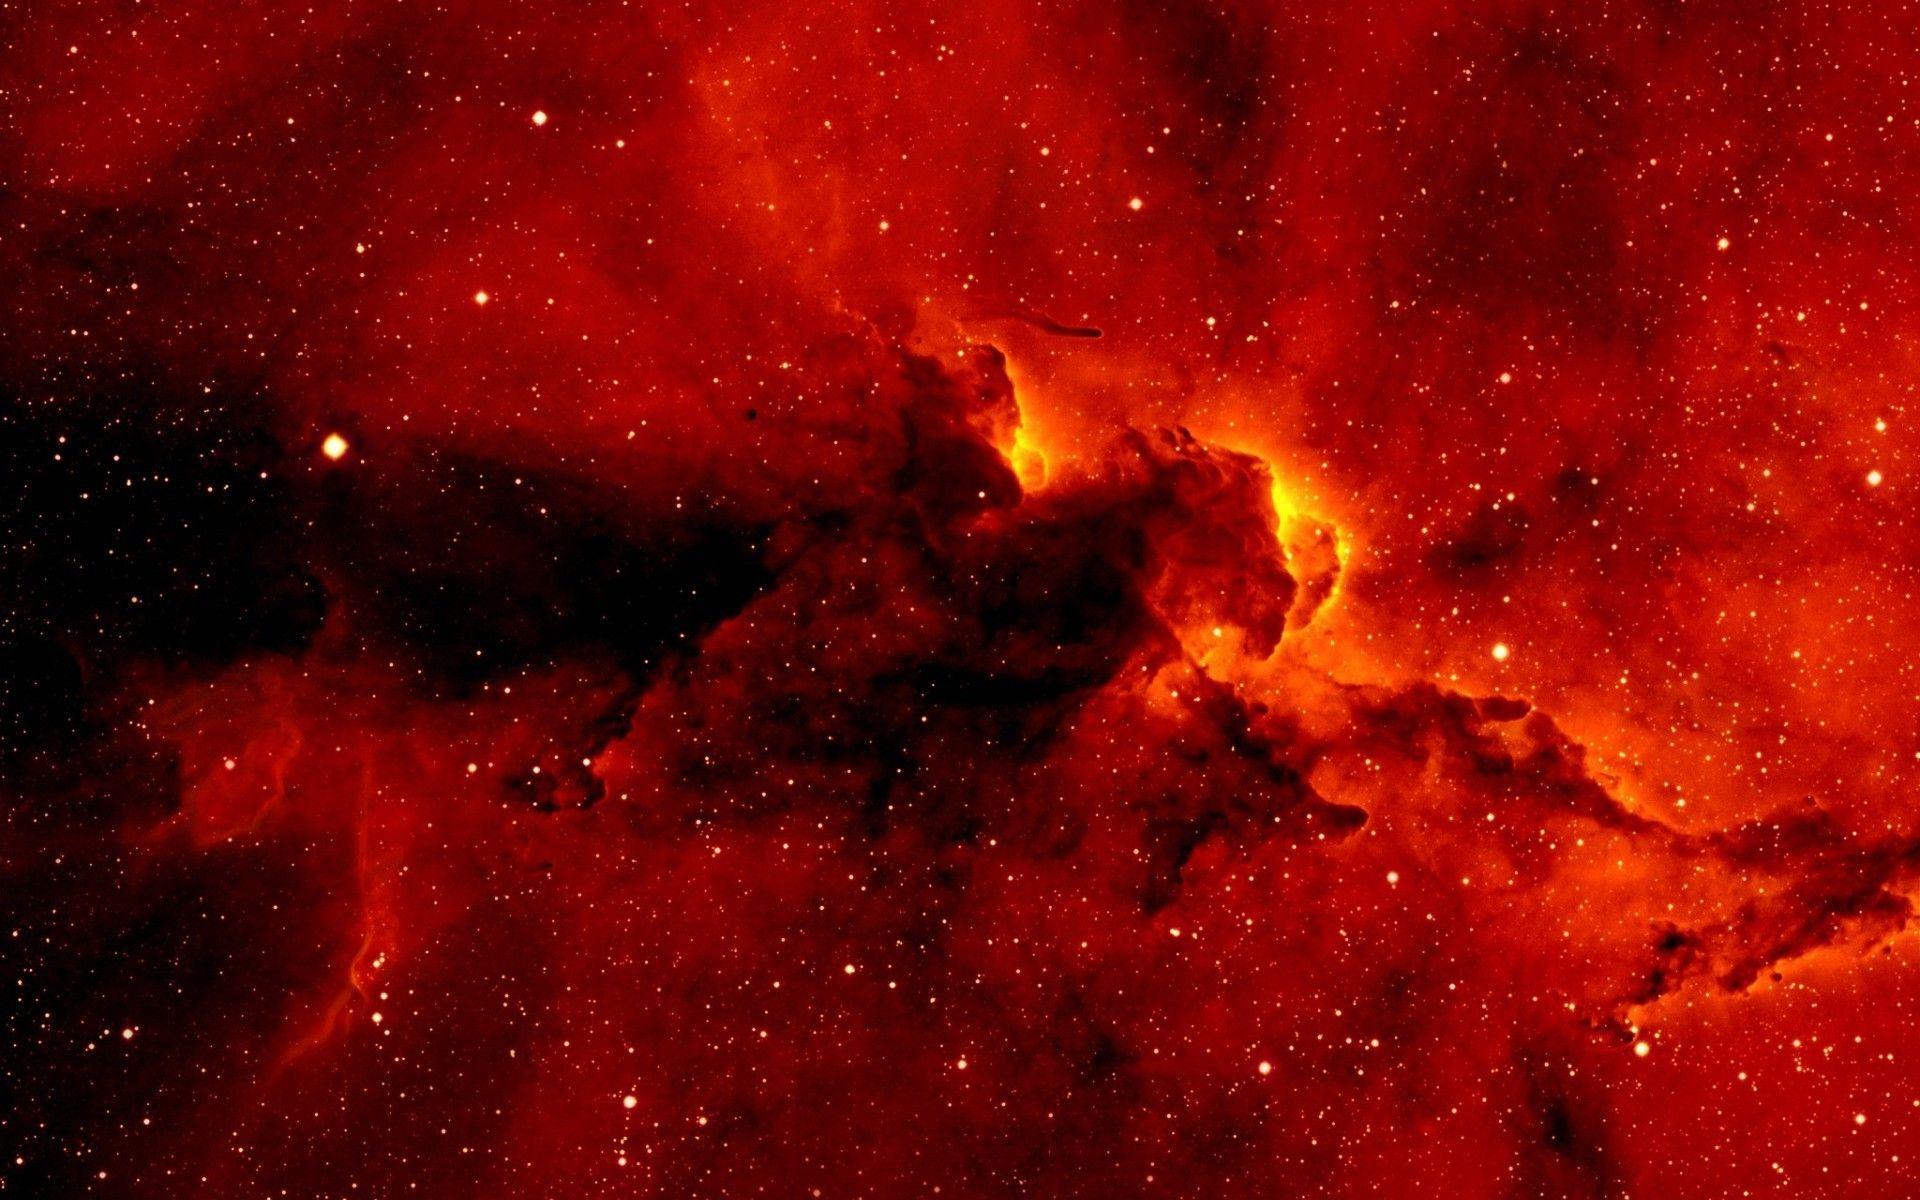 Red Galaxy Hd Desktop Wallpaper High Definition Fullscreen Galaxy Wallpaper Red Space Galaxies Wallpaper